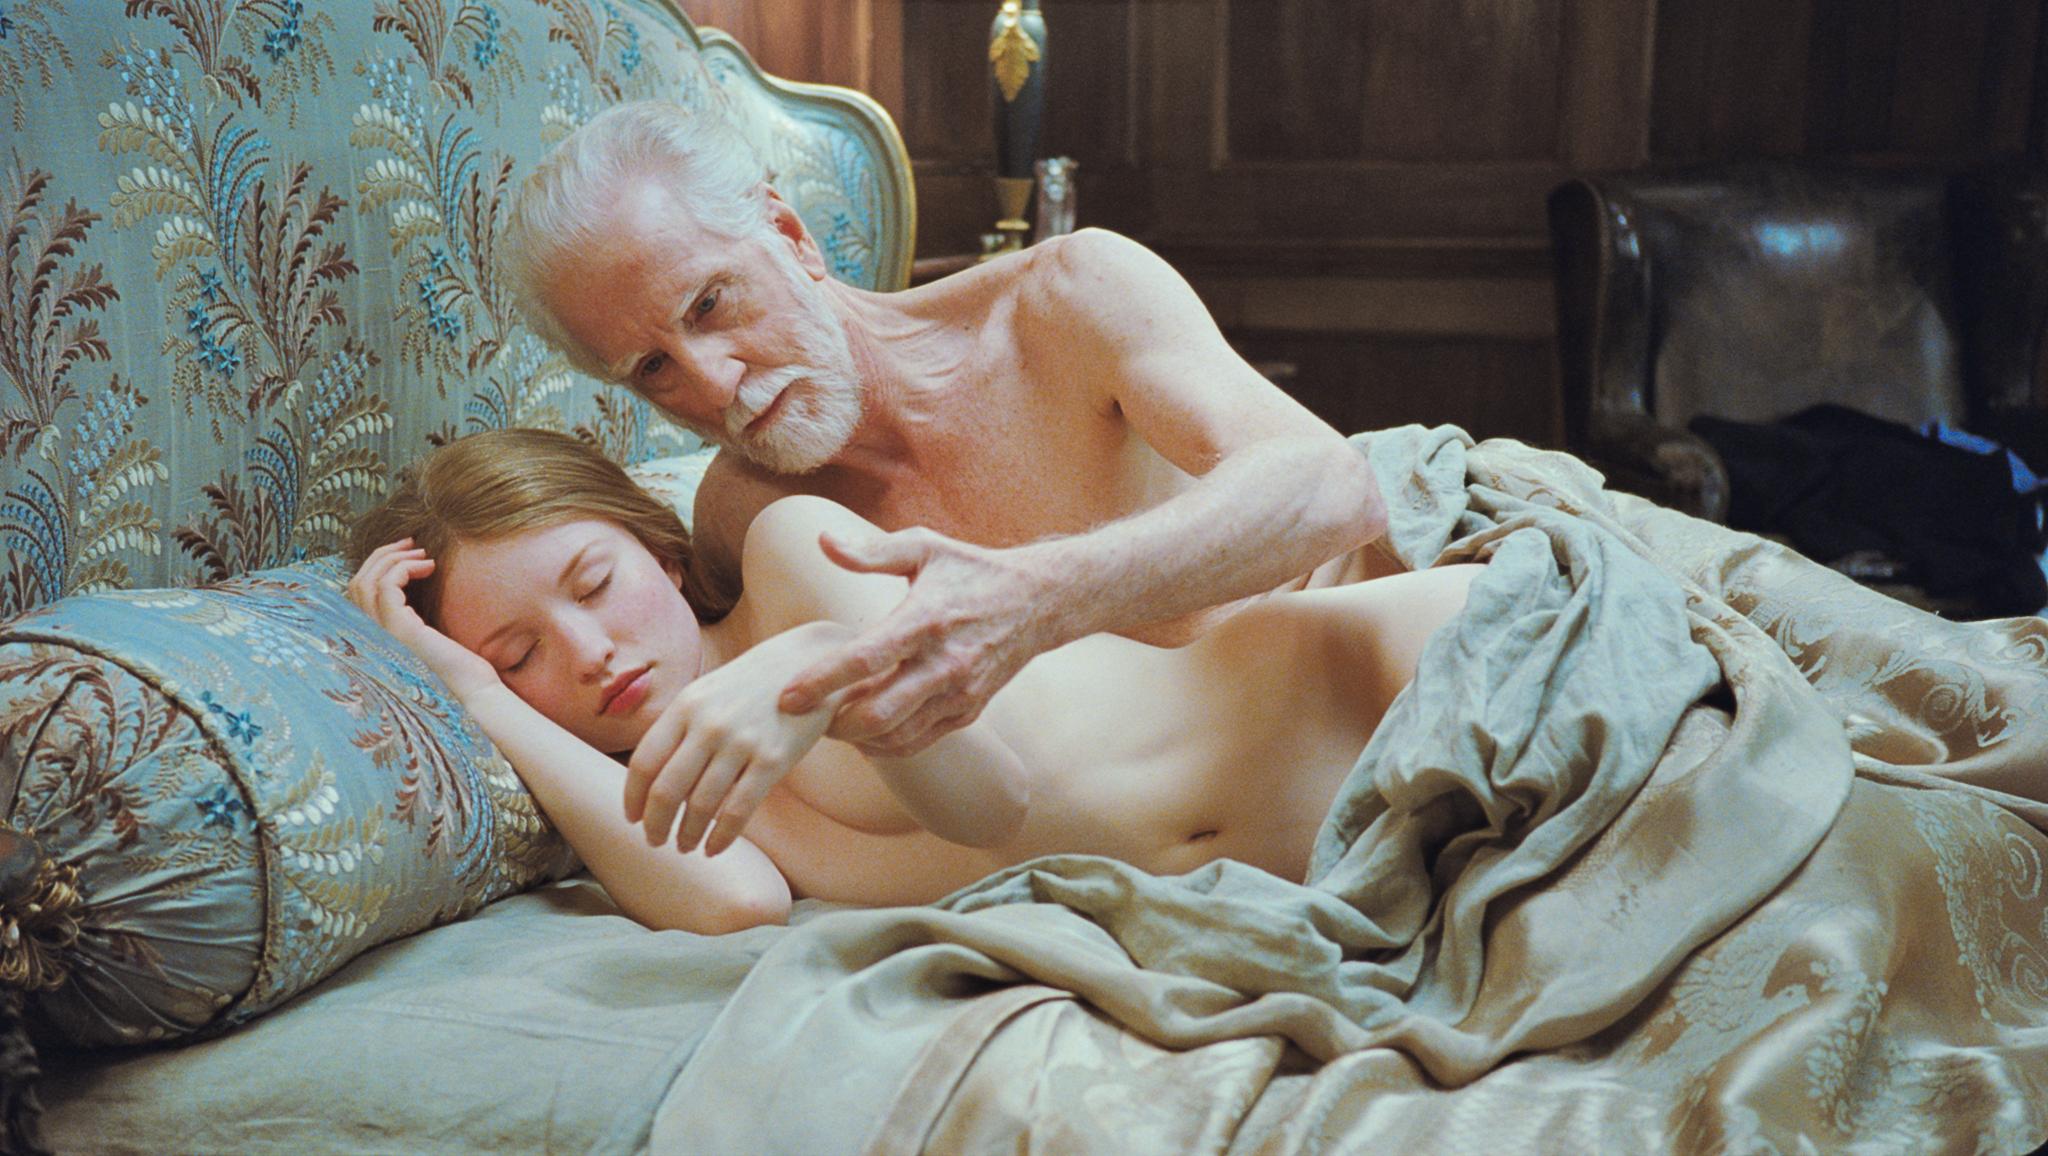 Nude beautiful woman hd 3gp cinema download sex clips